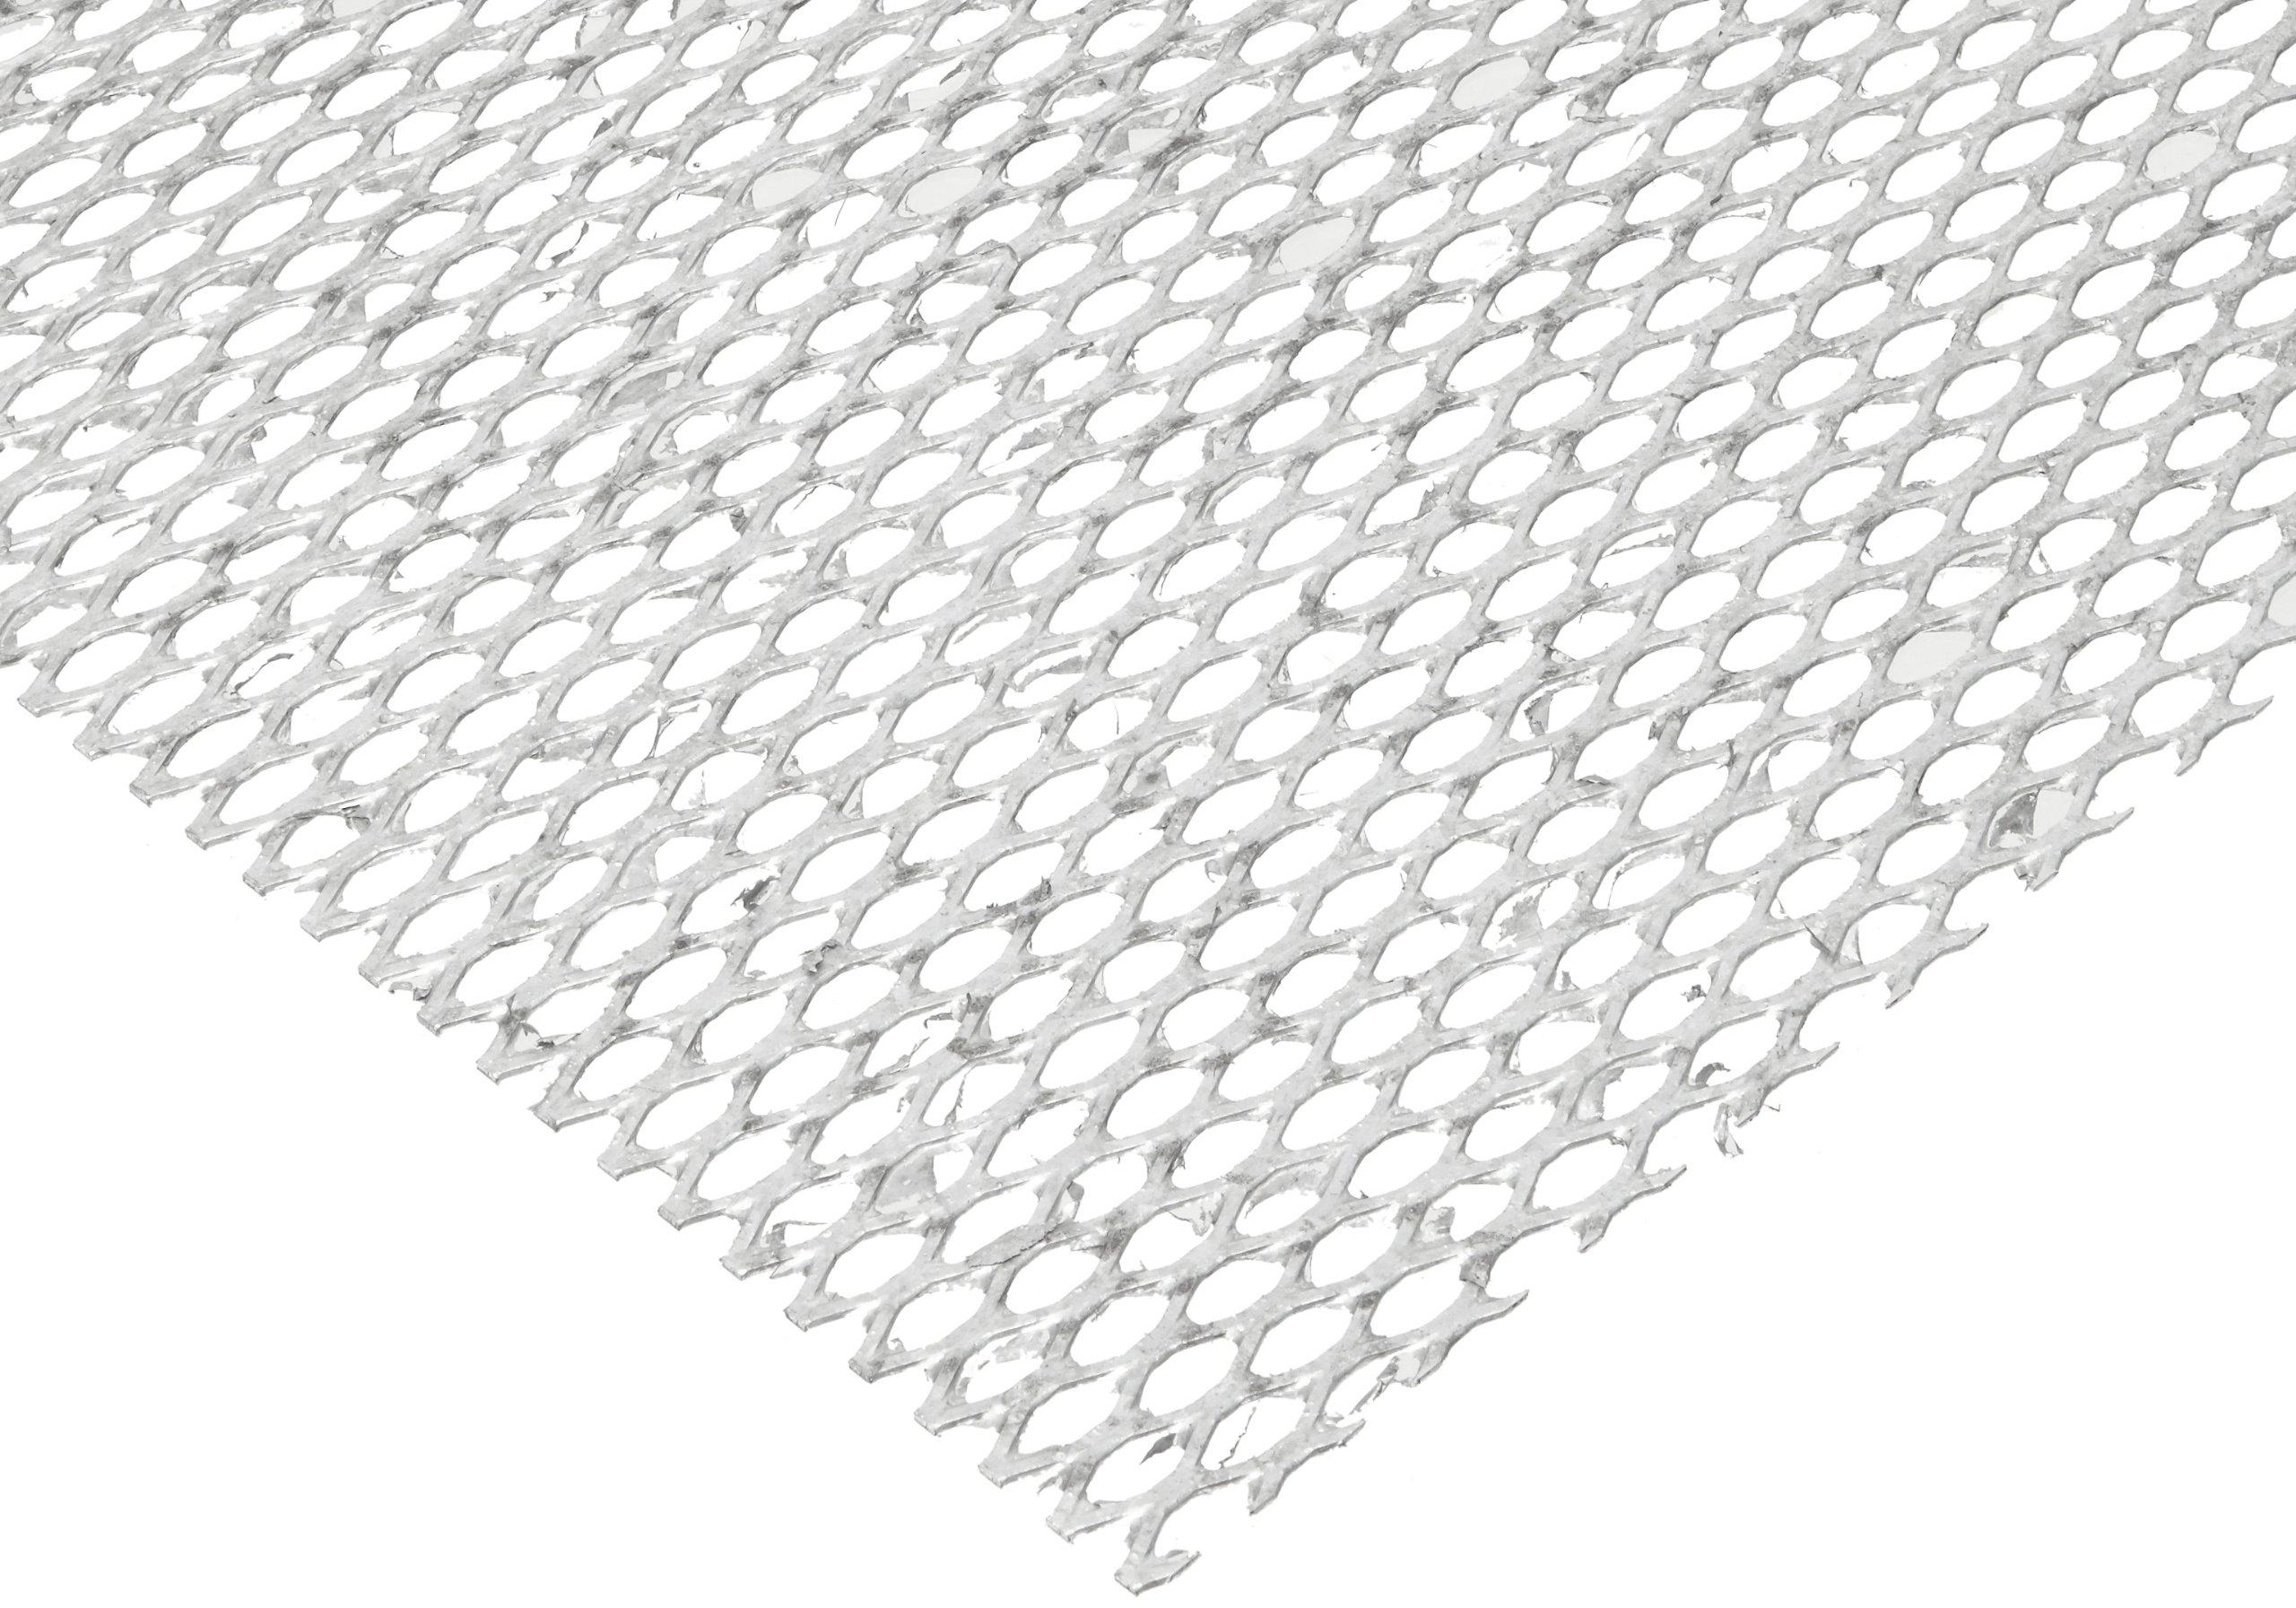 Steel Flat Expanded Sheet, Zinc Galvanized Finish, 48'' Width, 48'' Length, 0.50'' SWD x 1.25'' LWD Opening, 16 Gauge